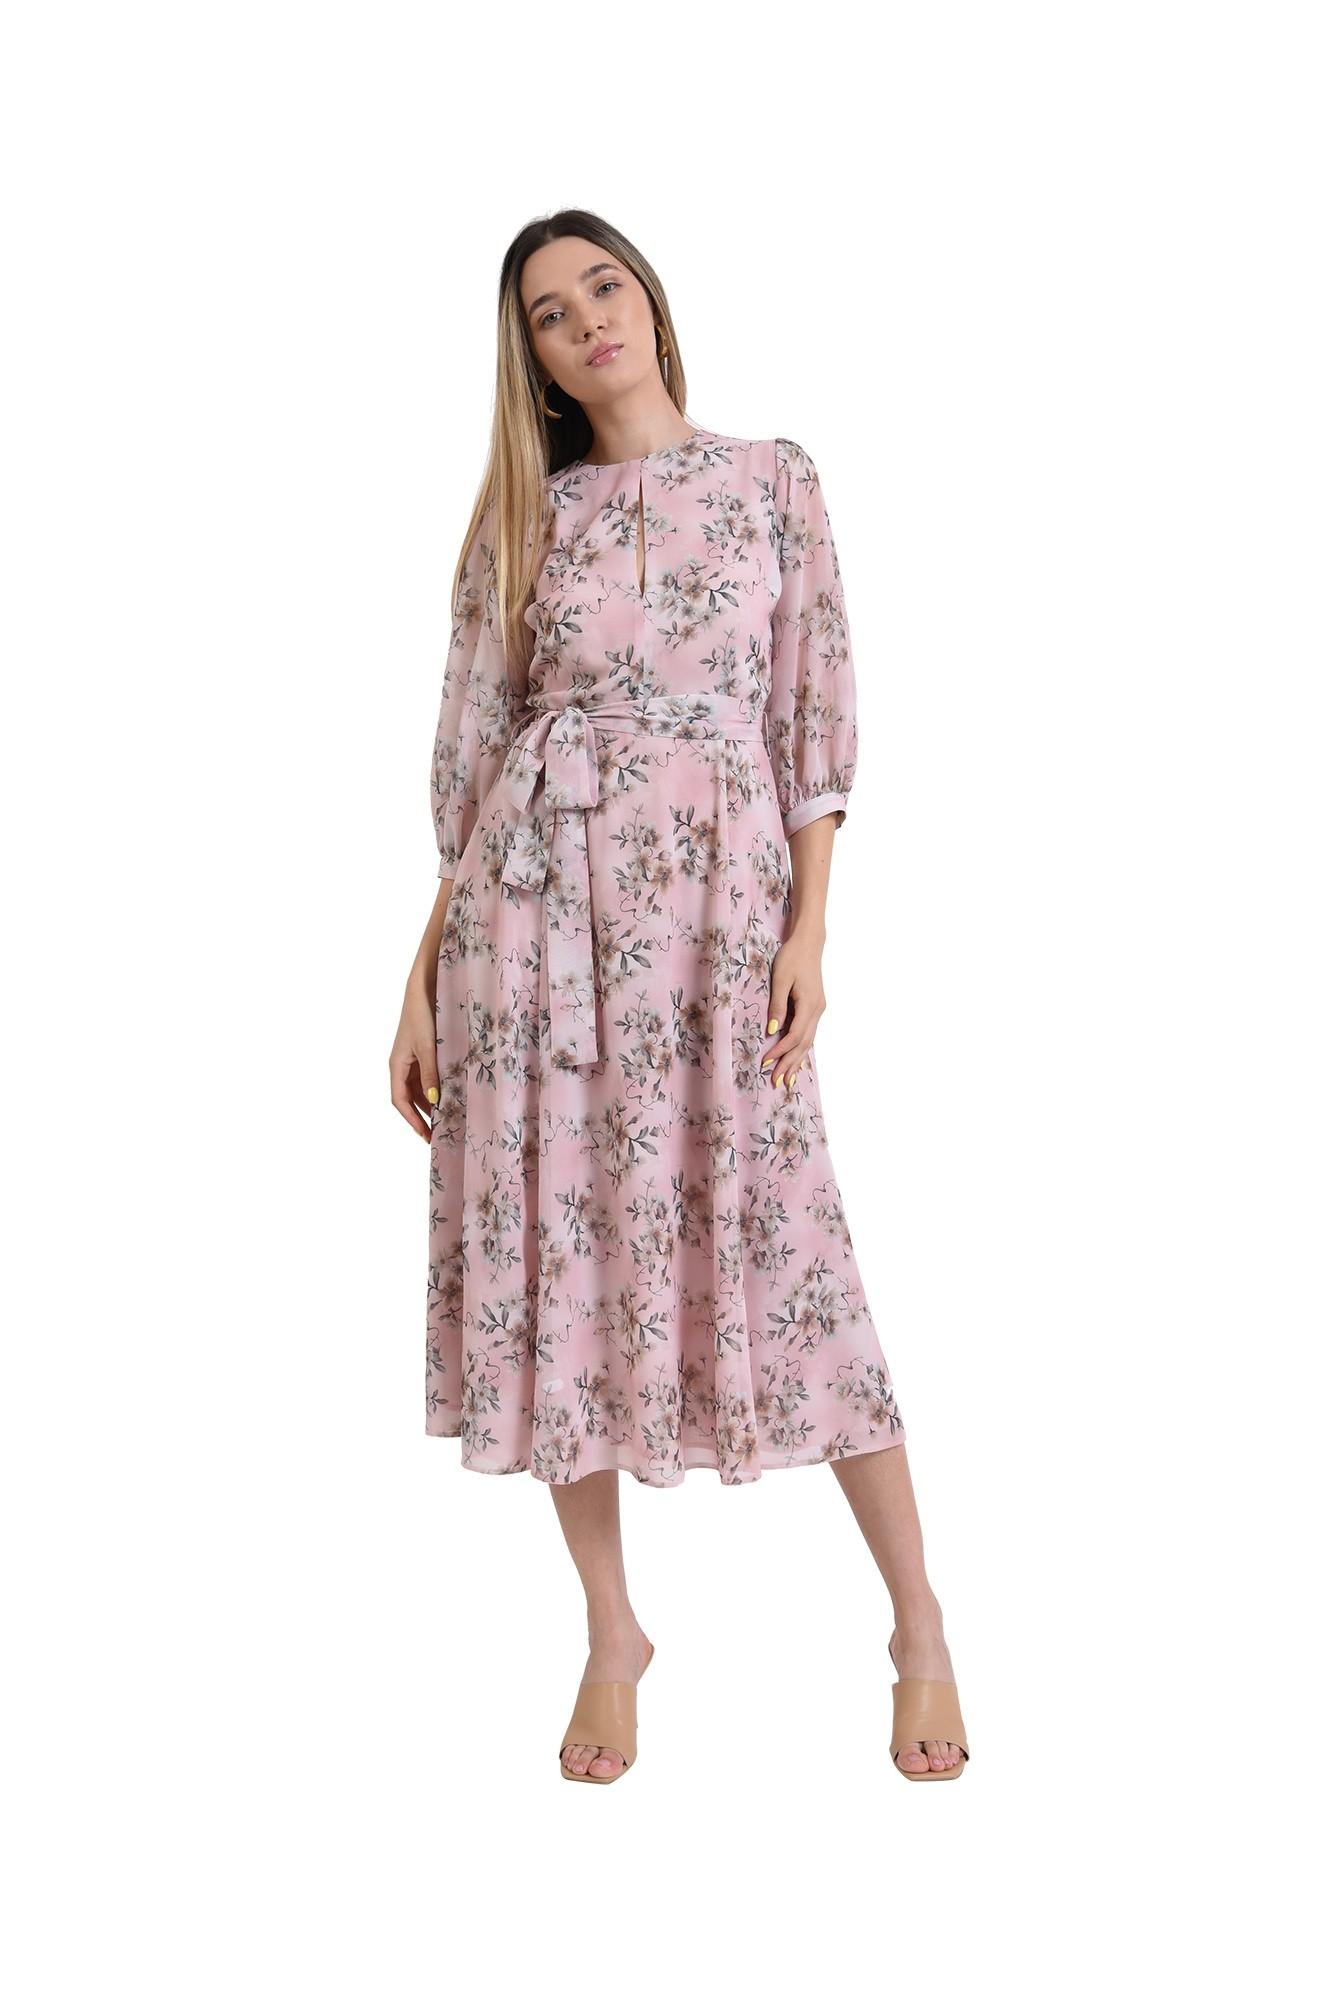 rochie midi, evazata, roz, florala, eleganta